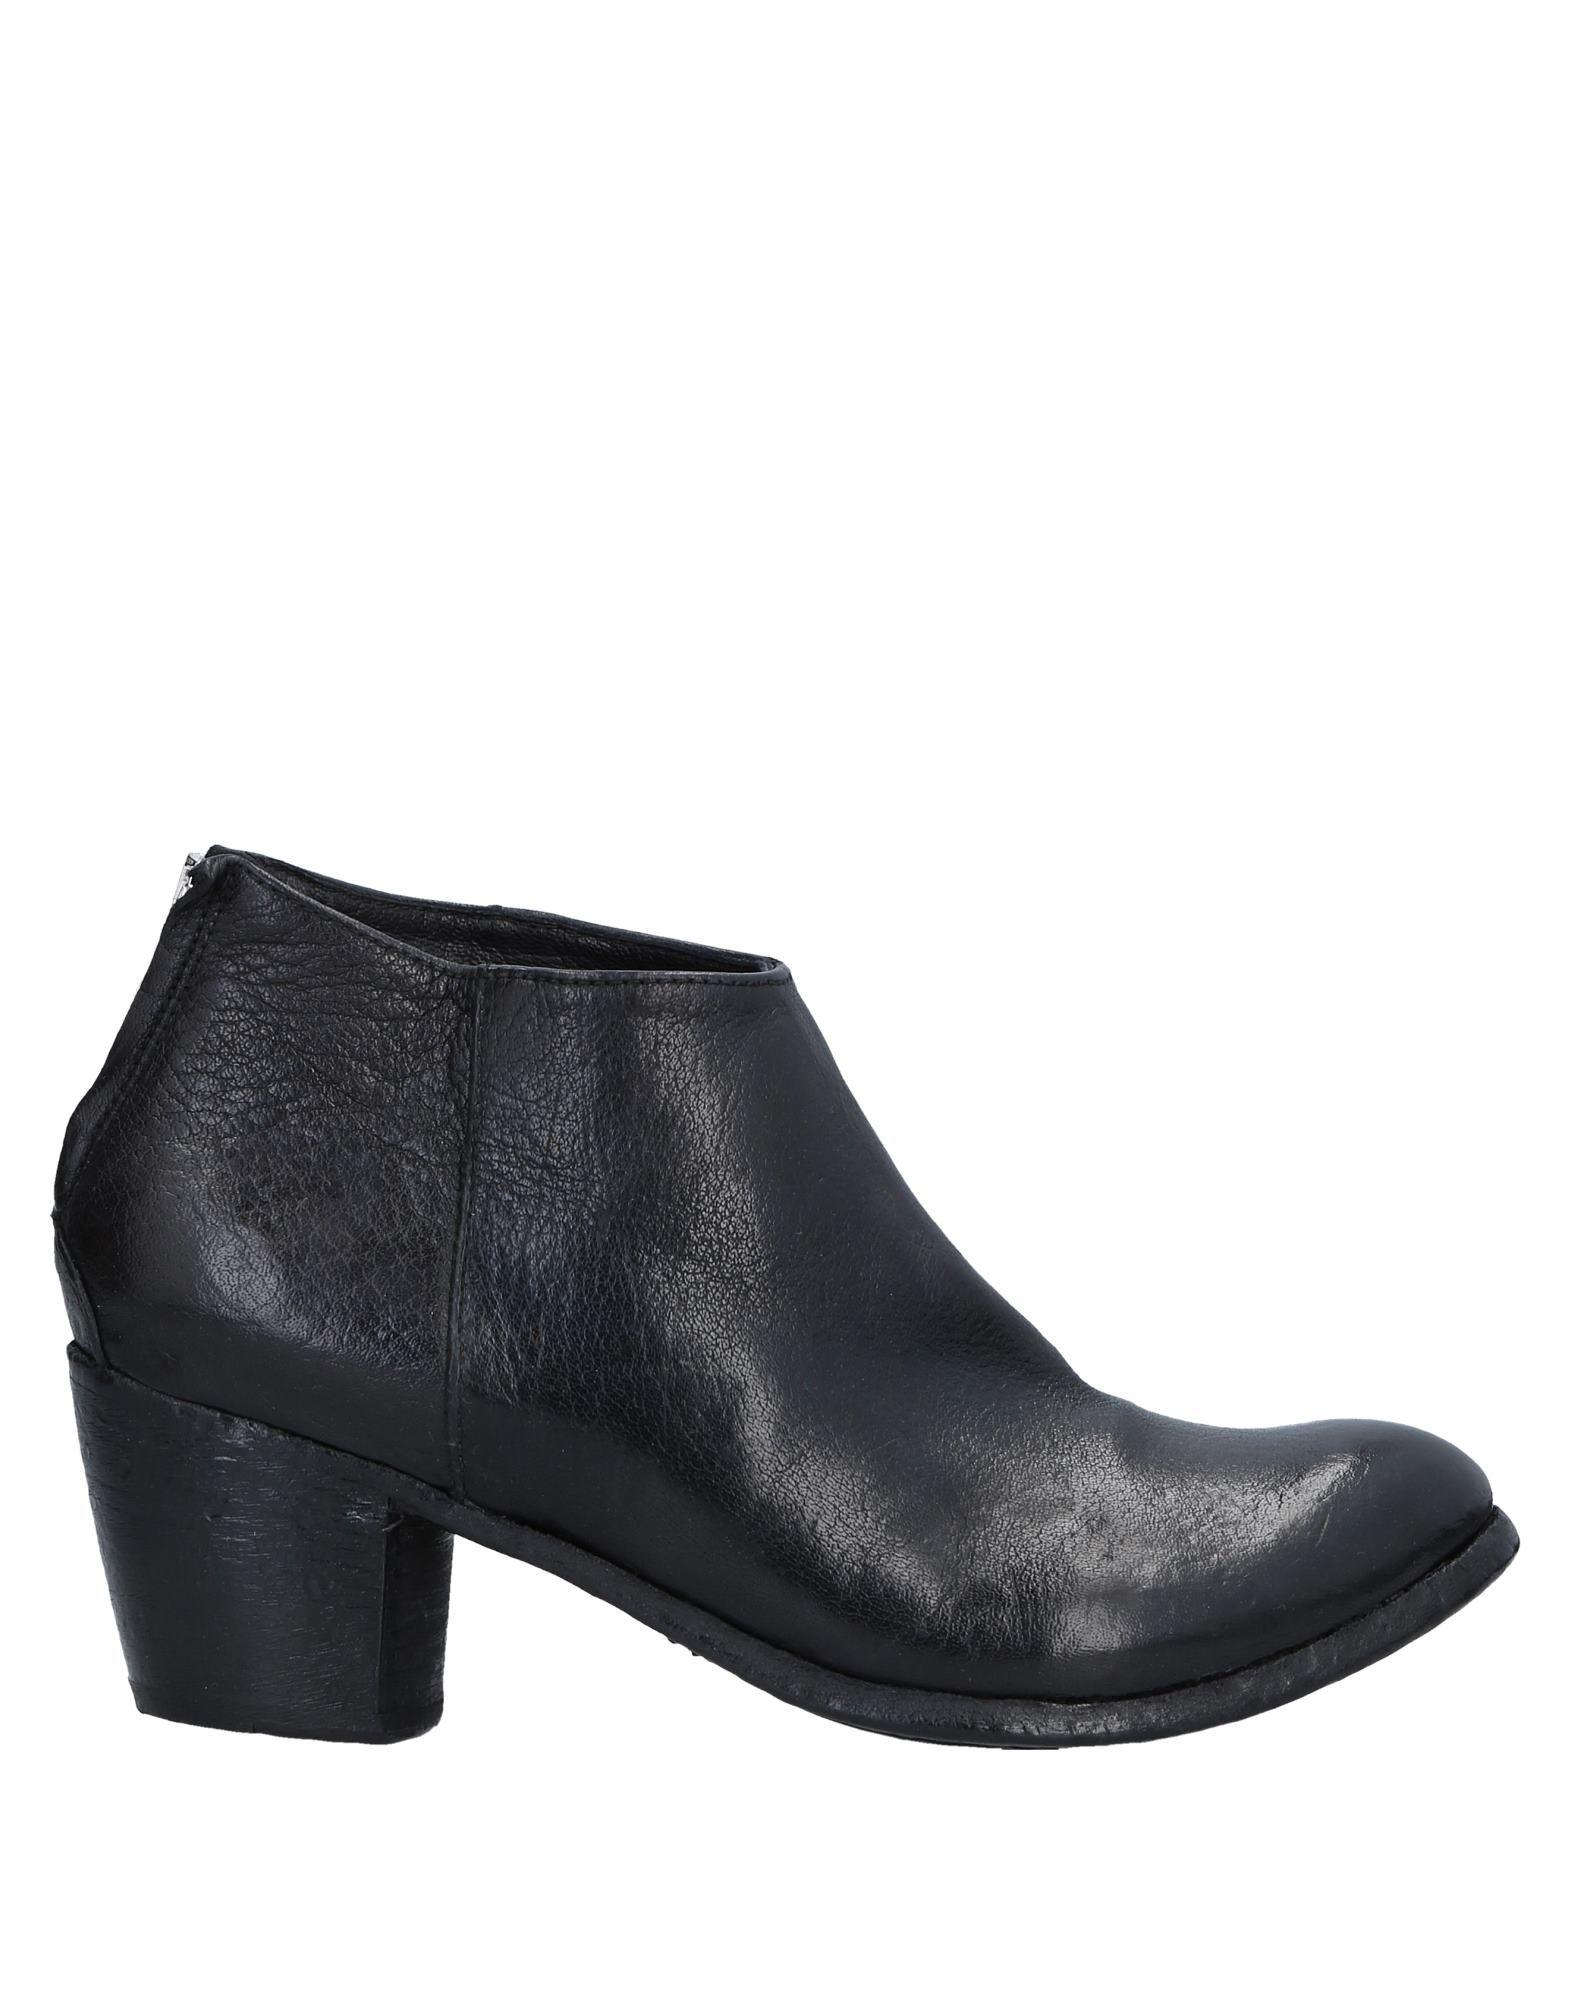 OPEN CLOSED SHOES Полусапоги и высокие ботинки women high heel shoes sexy lace spring quality footwear fashion heeled open toe ladies new pumps shoes size 33 43 p22426